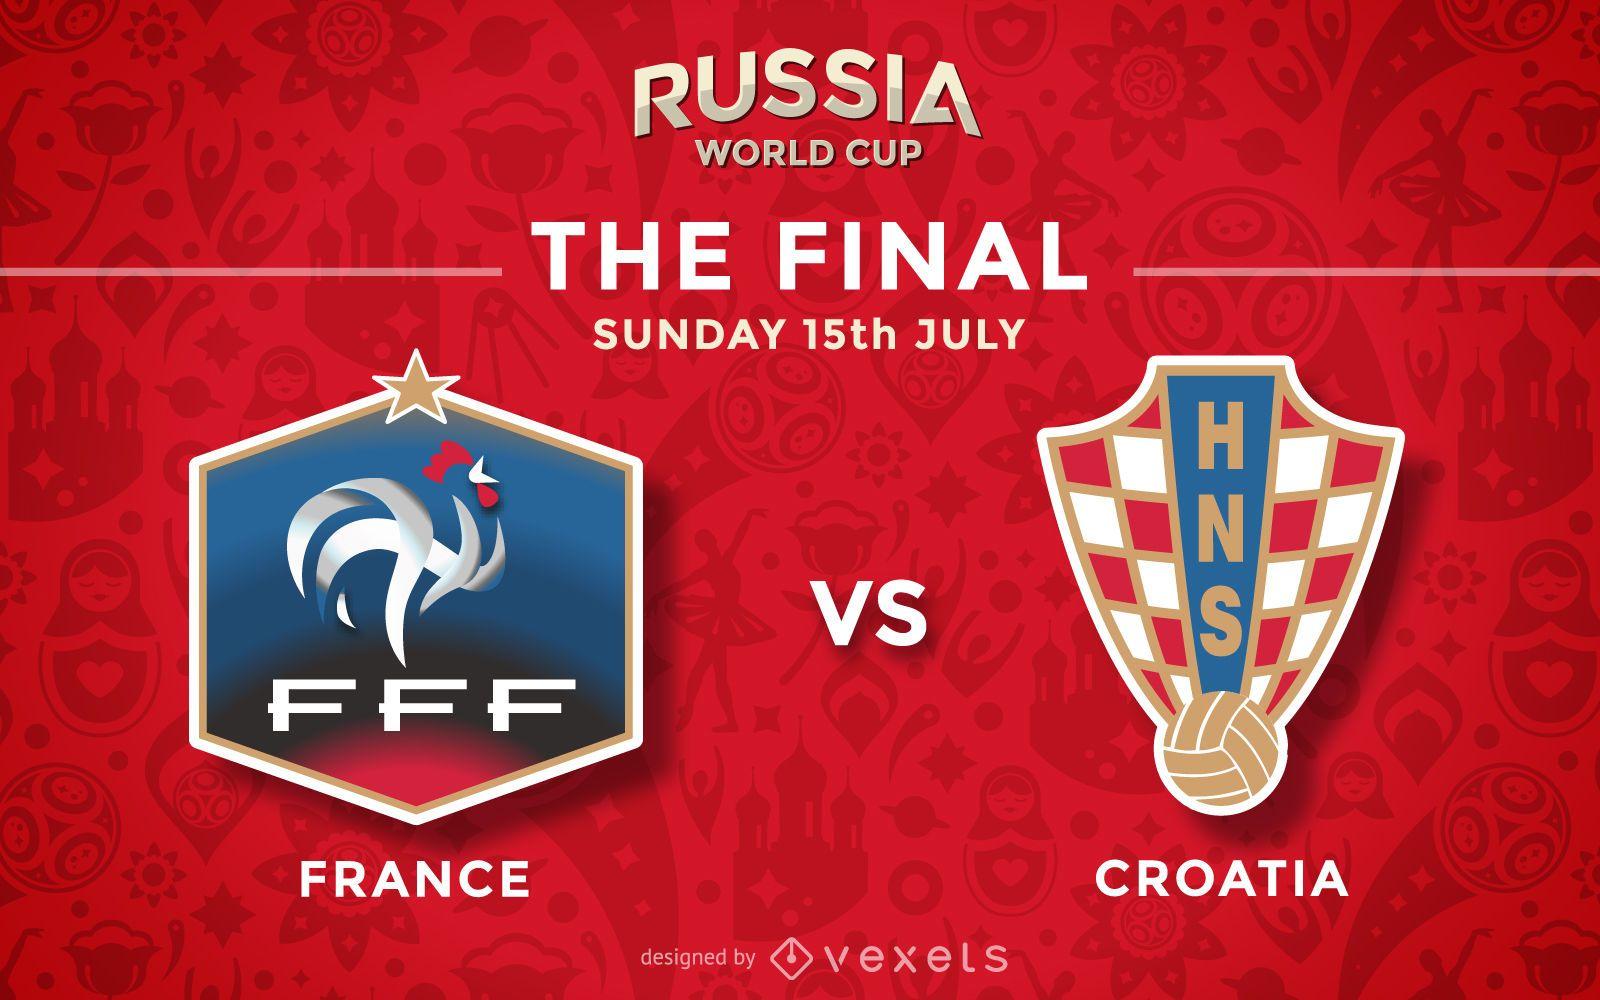 Russia World Cup final match